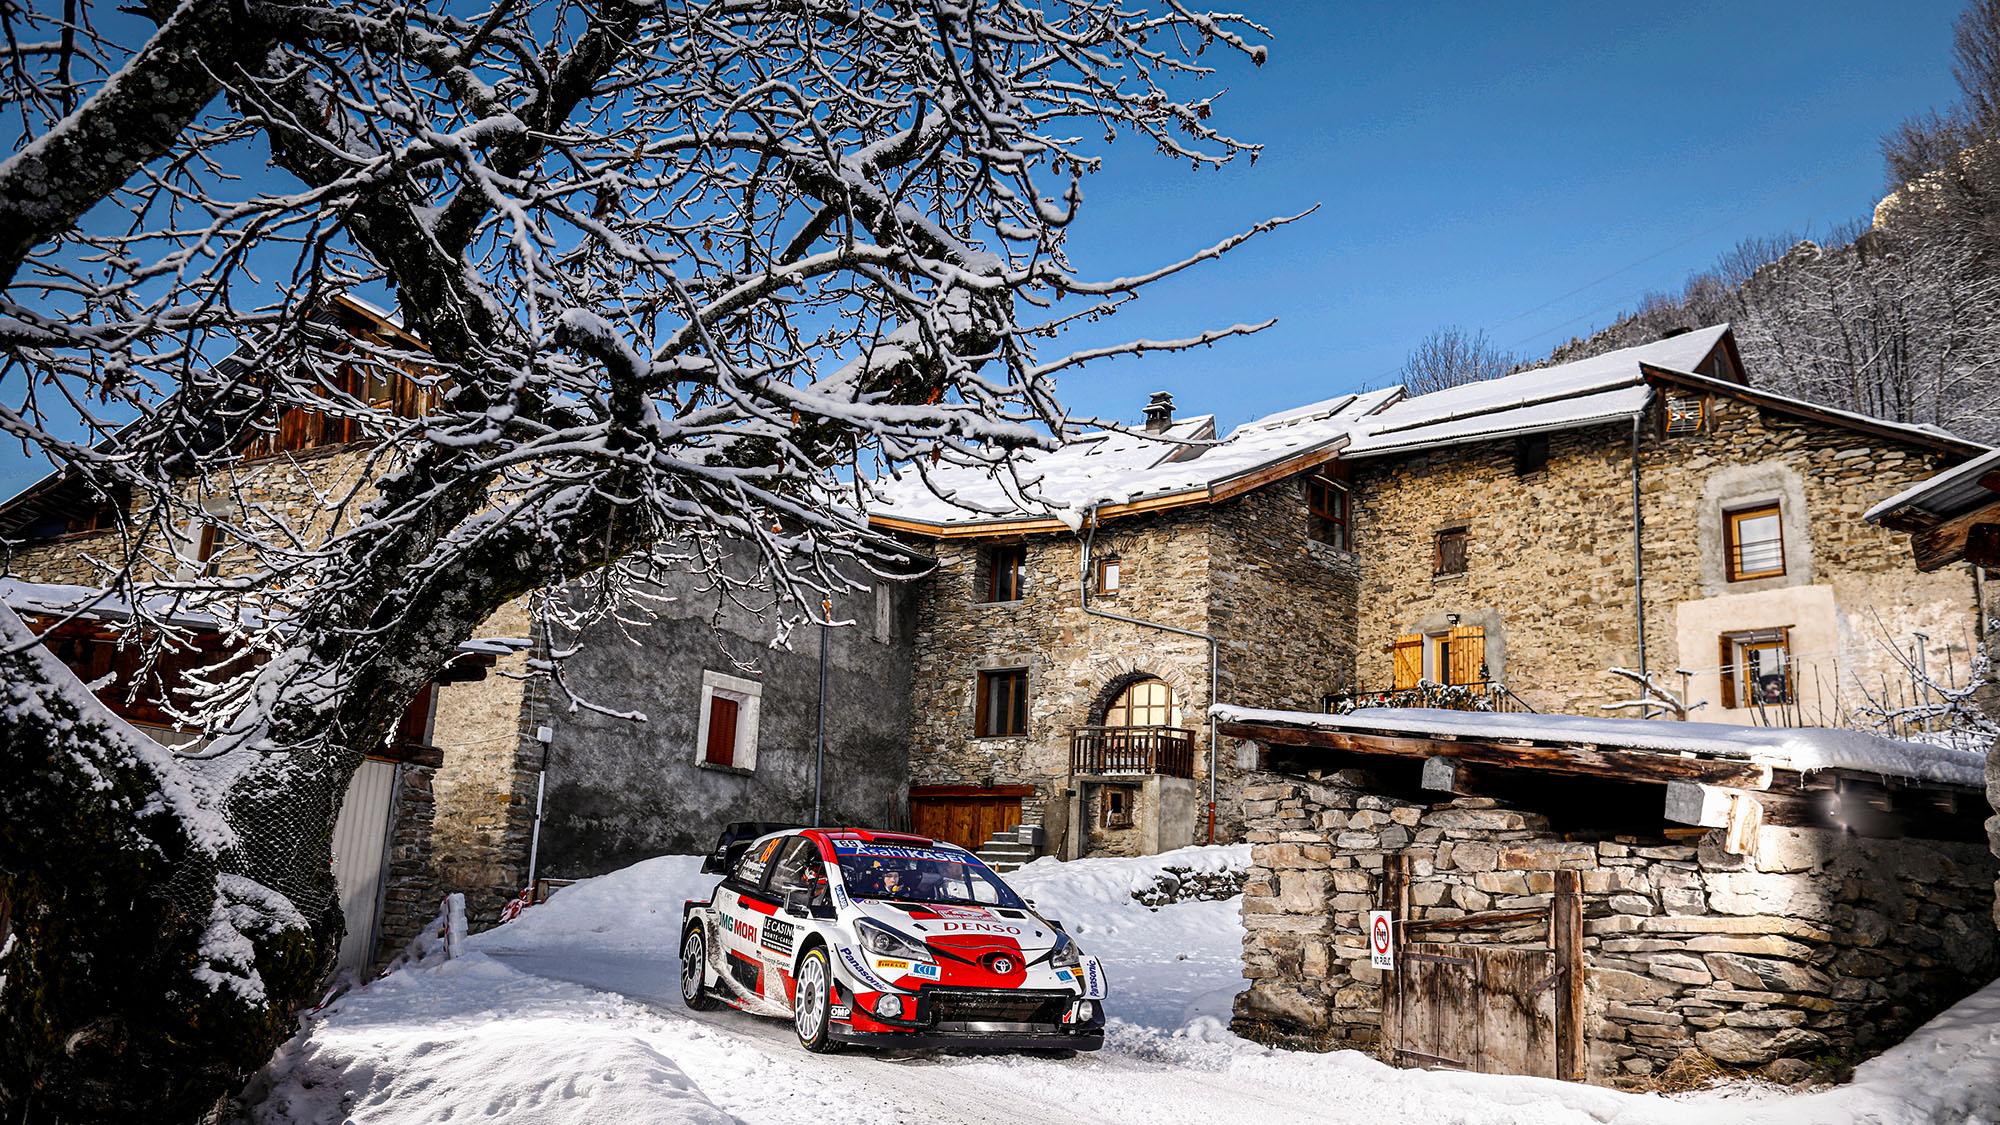 Kalle Rovanpera in the 2021 Monte Carlo rally